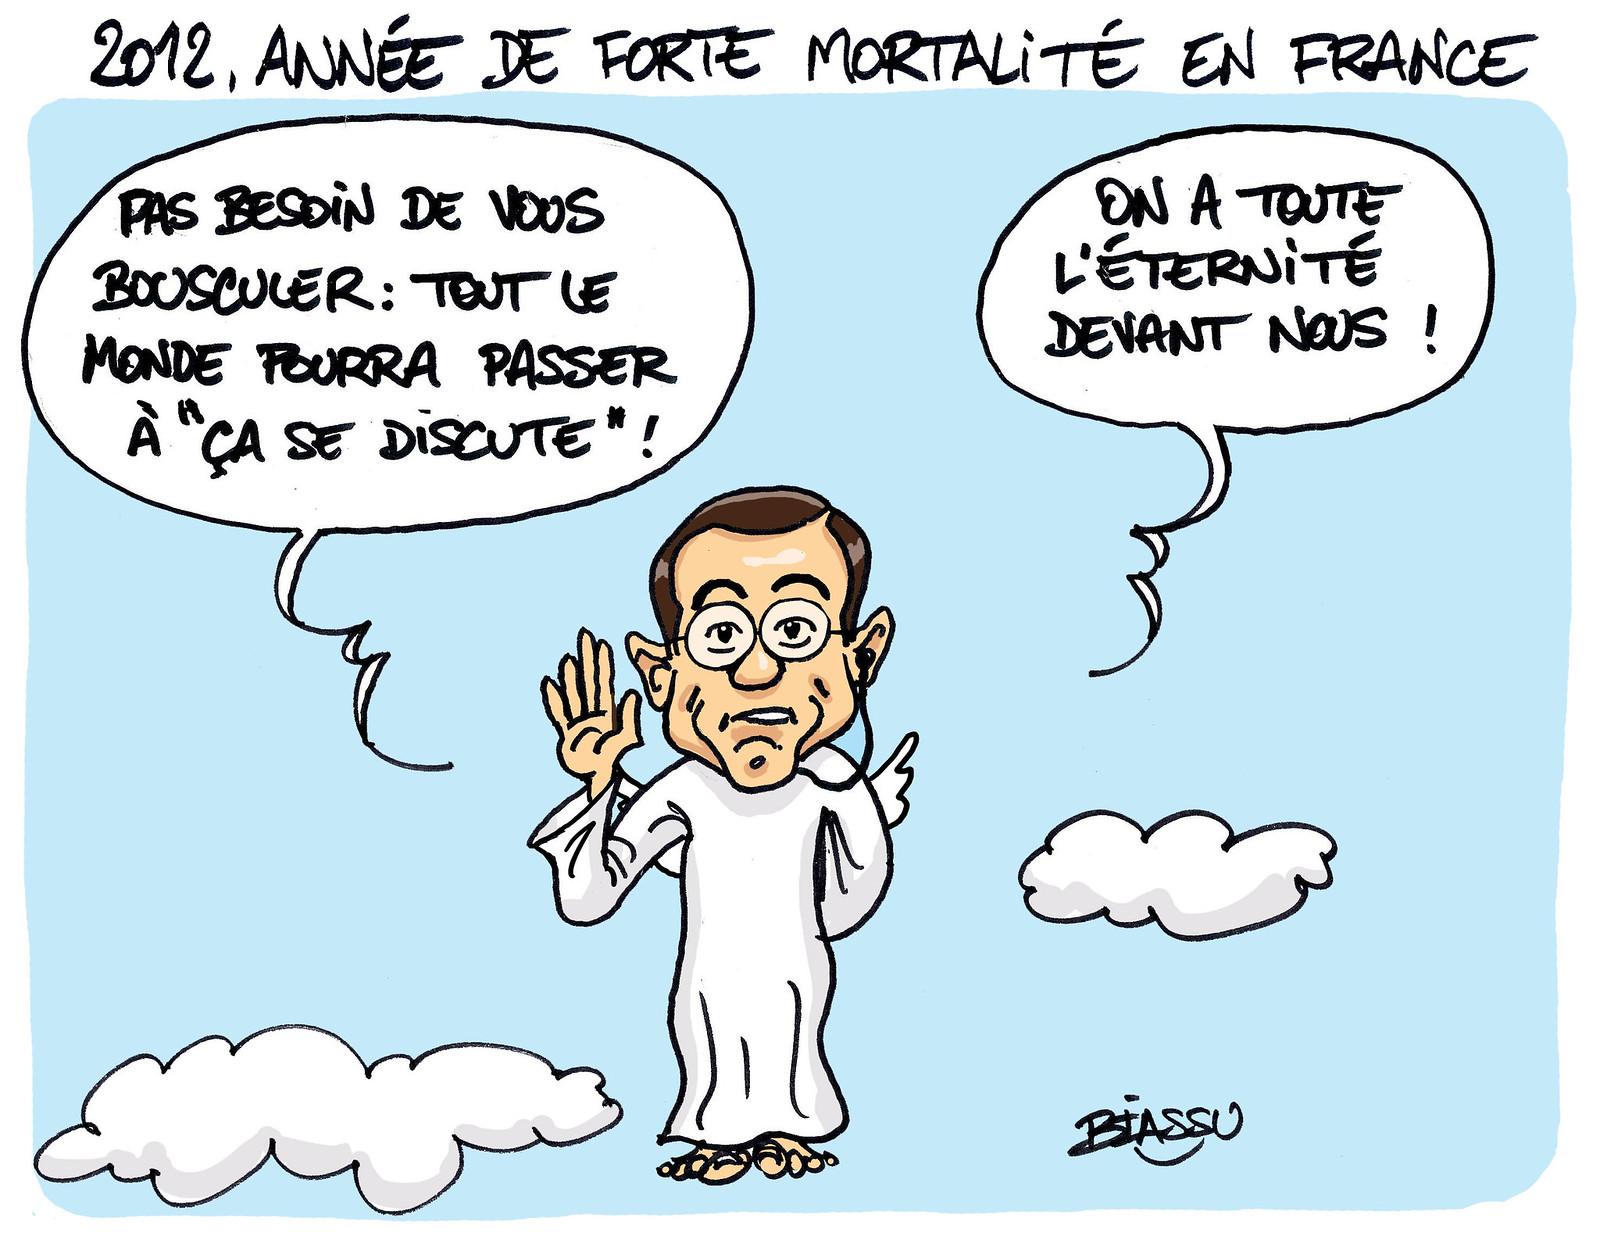 delarue+humour+biassu+mortalité+2012